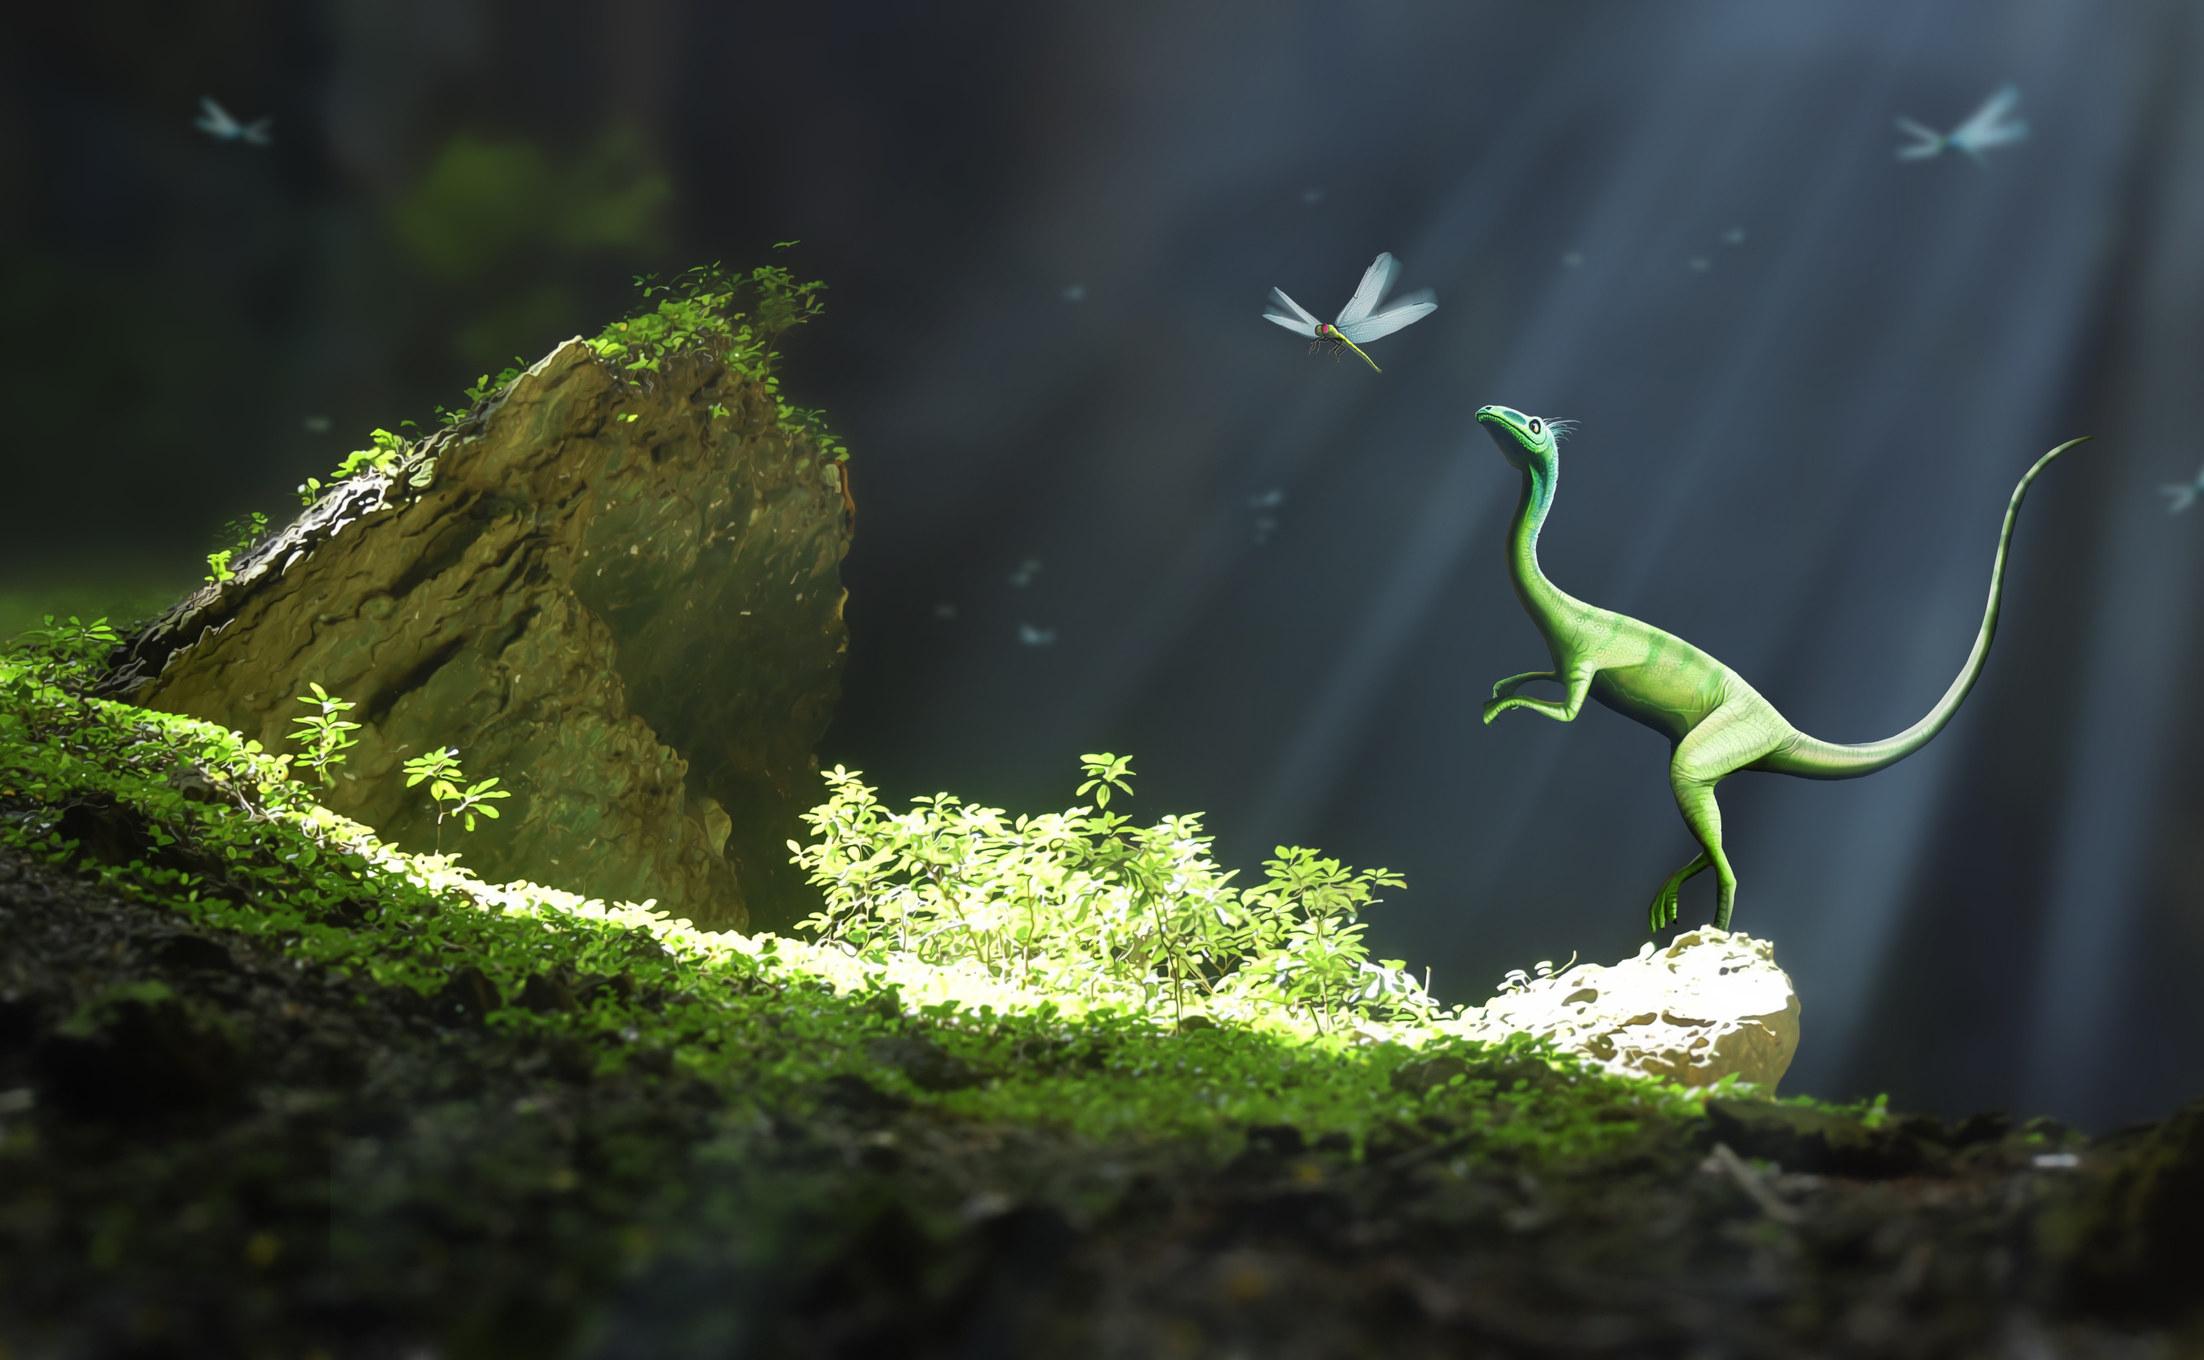 a itty bitty dinosaur